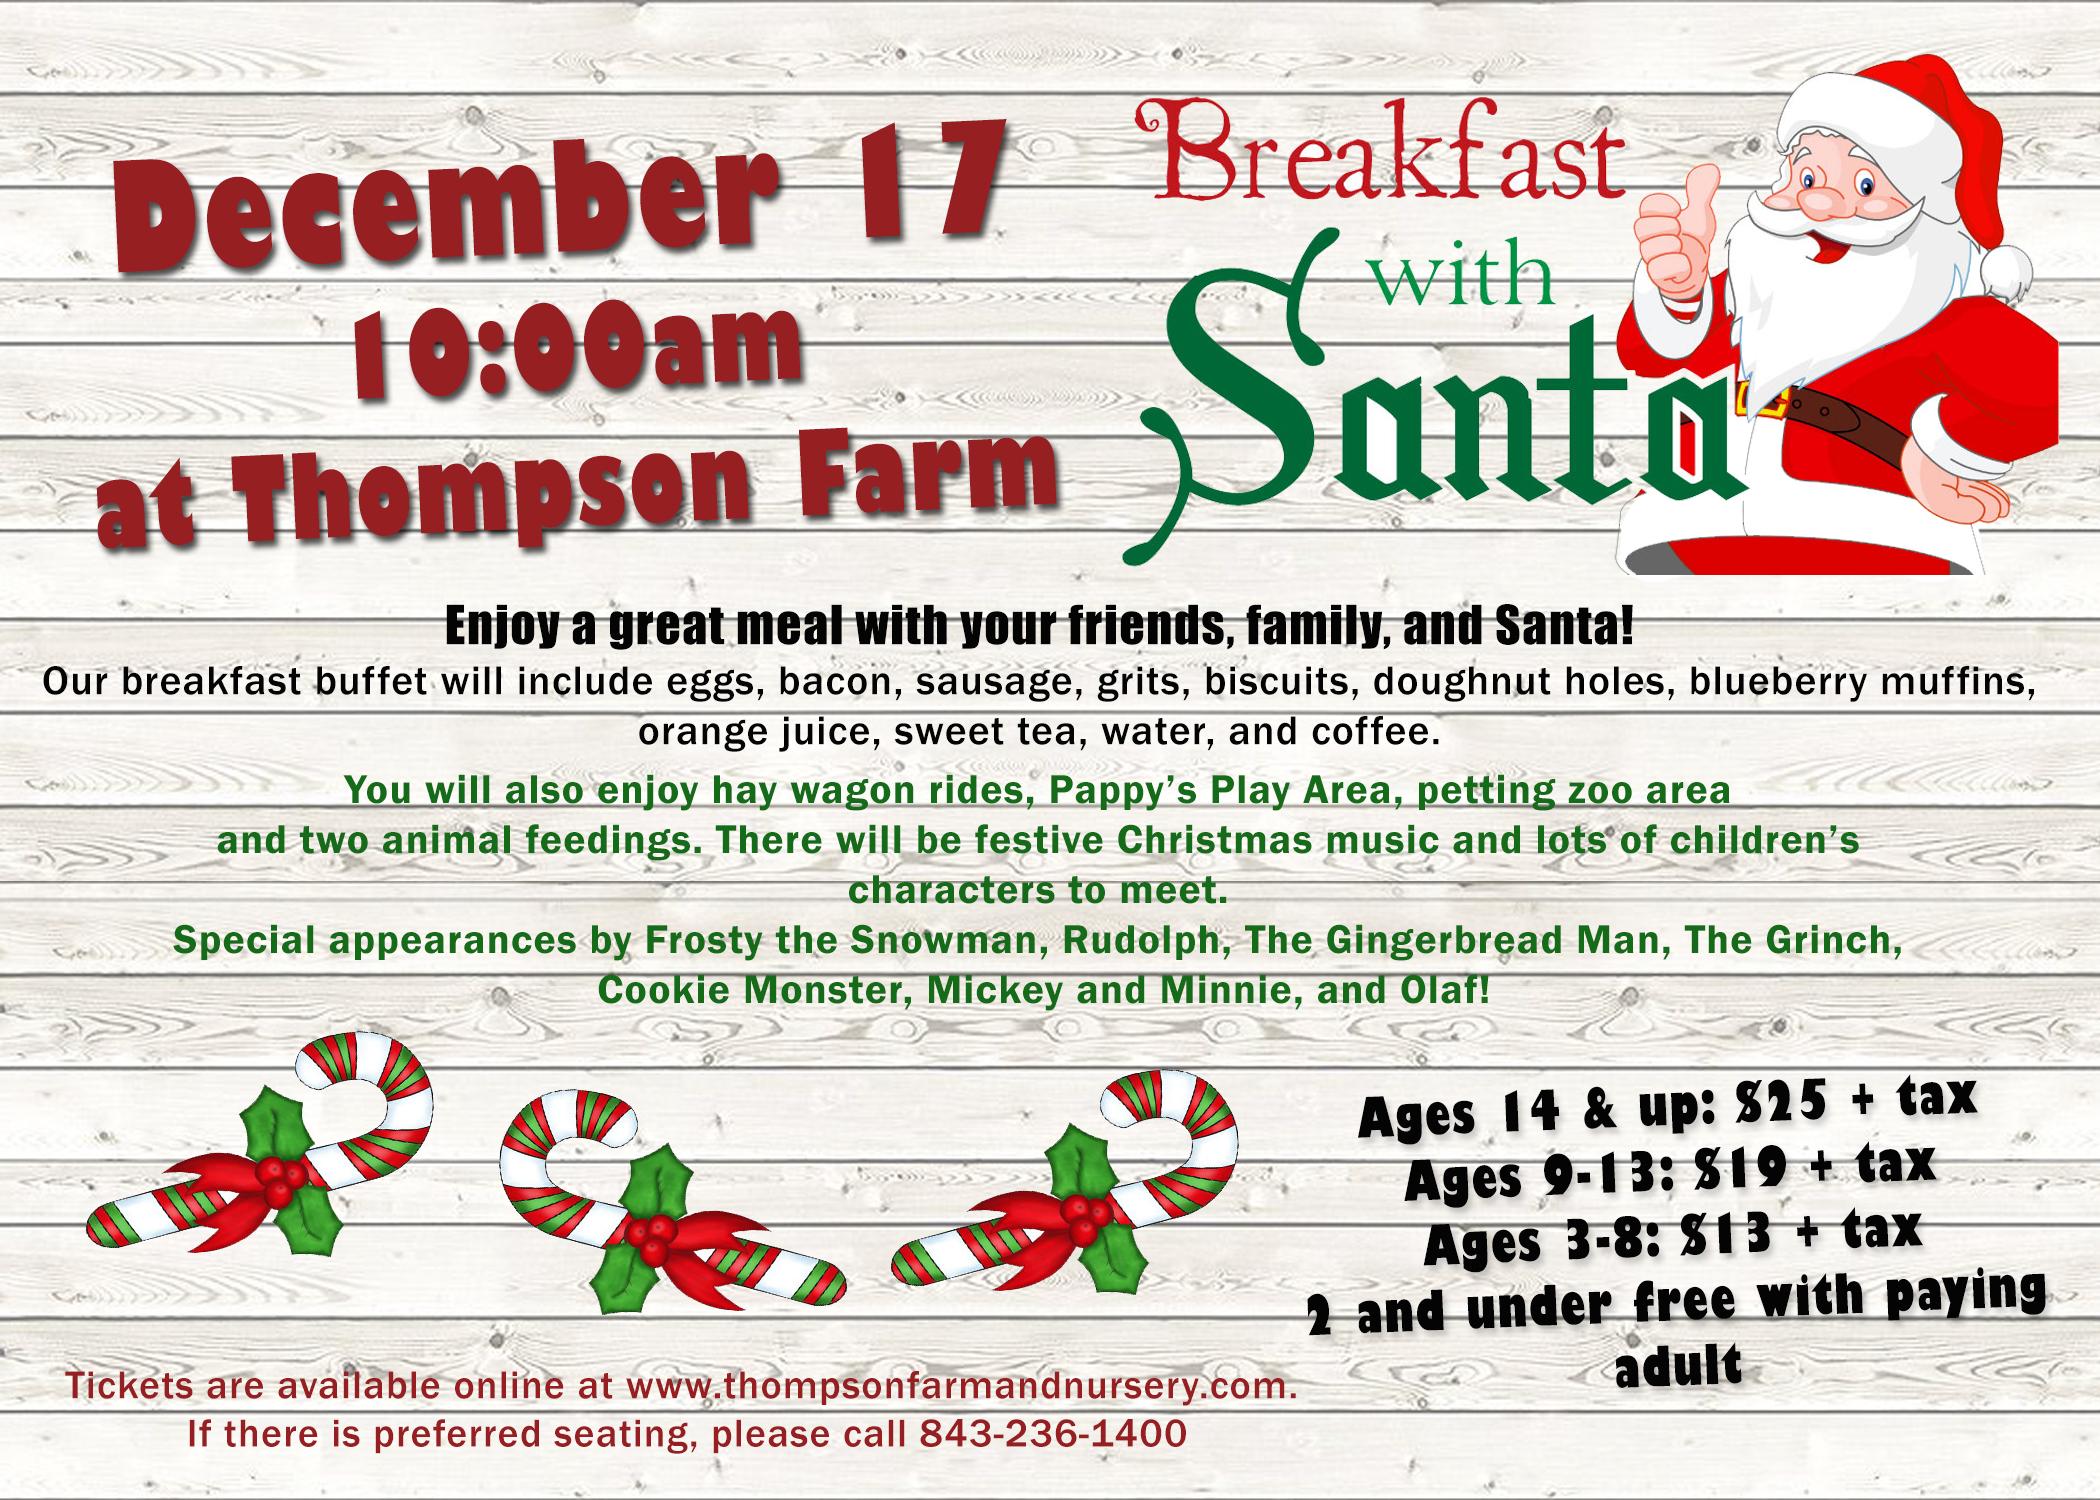 thompson-farm-breakfast-with-santa-2016-image